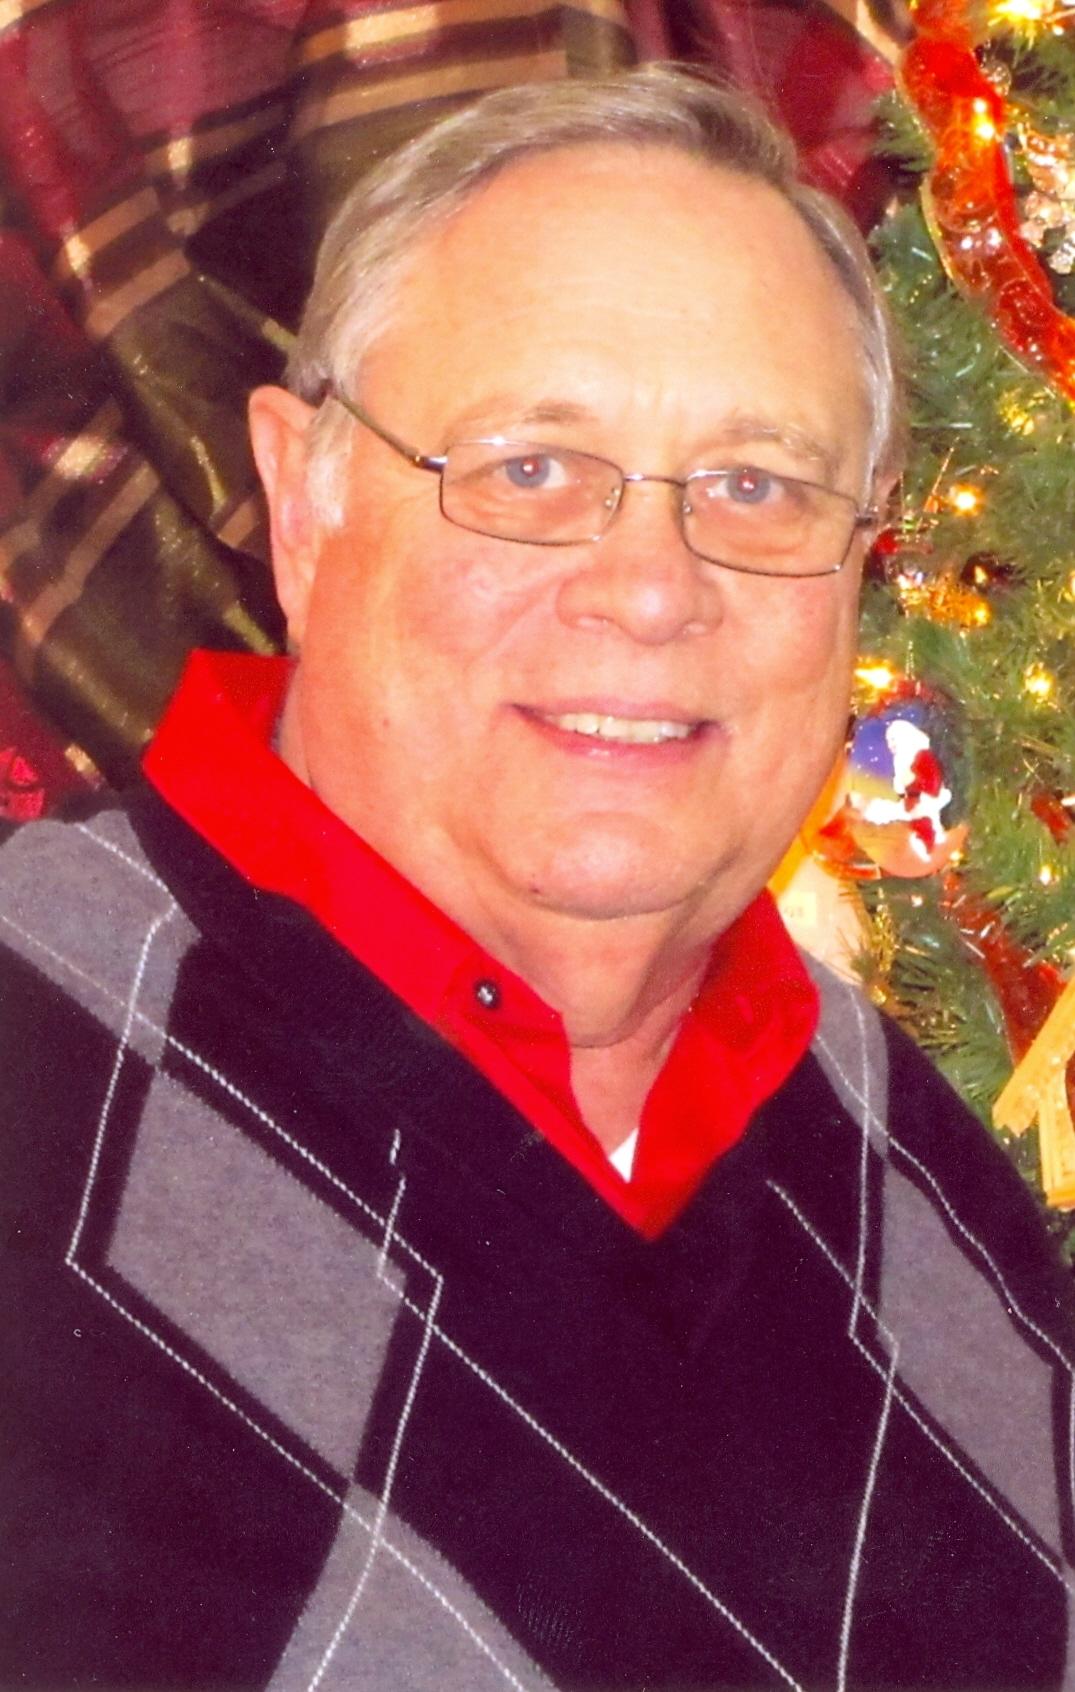 Curtis   Dale Piepenburg